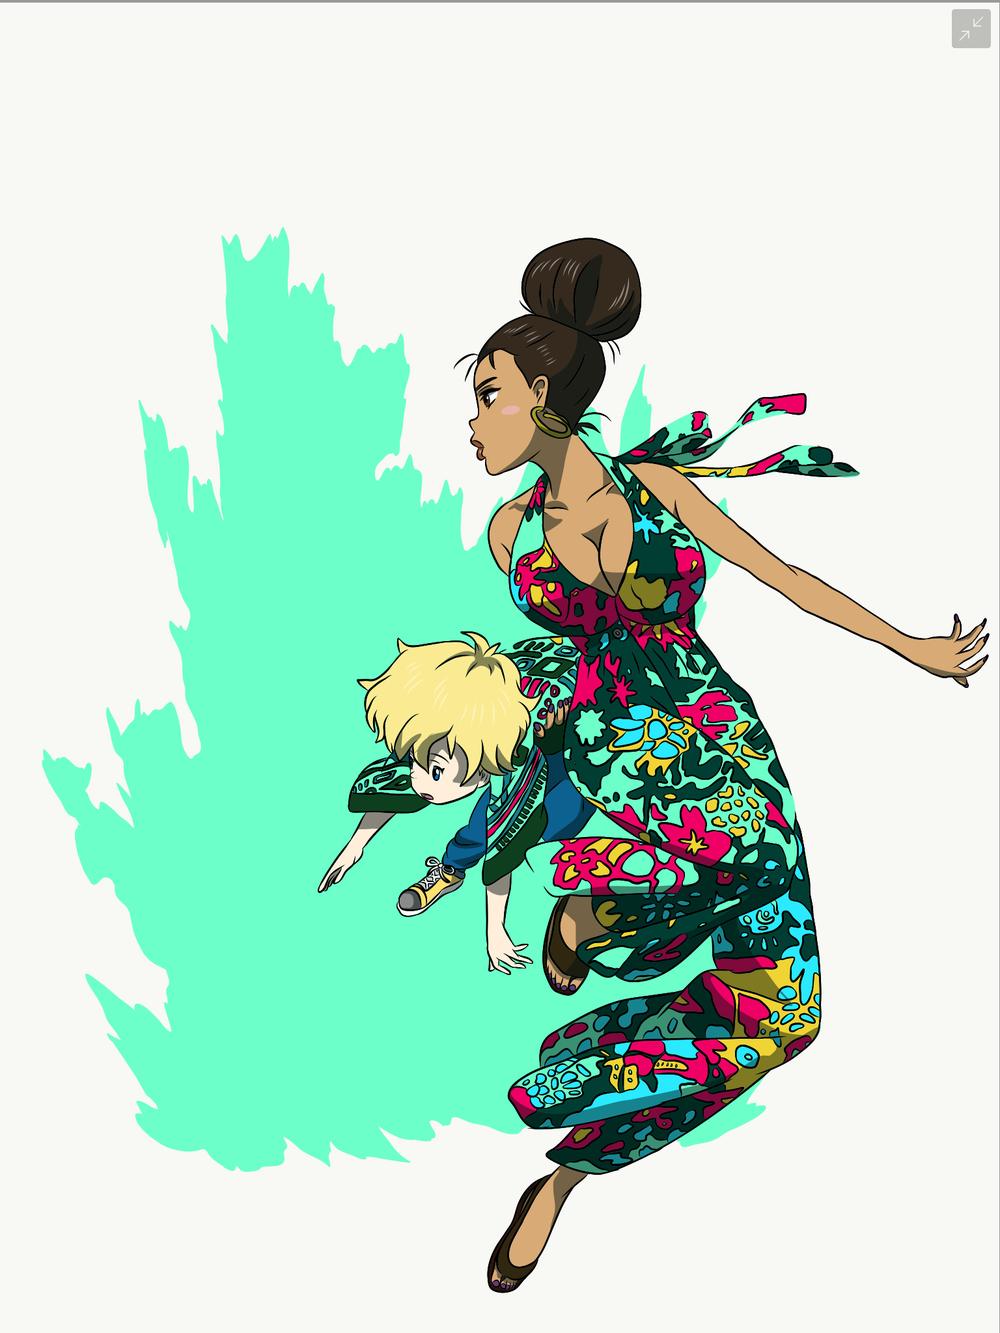 michiko-and-hatchin-pop-art-process-image-4.png